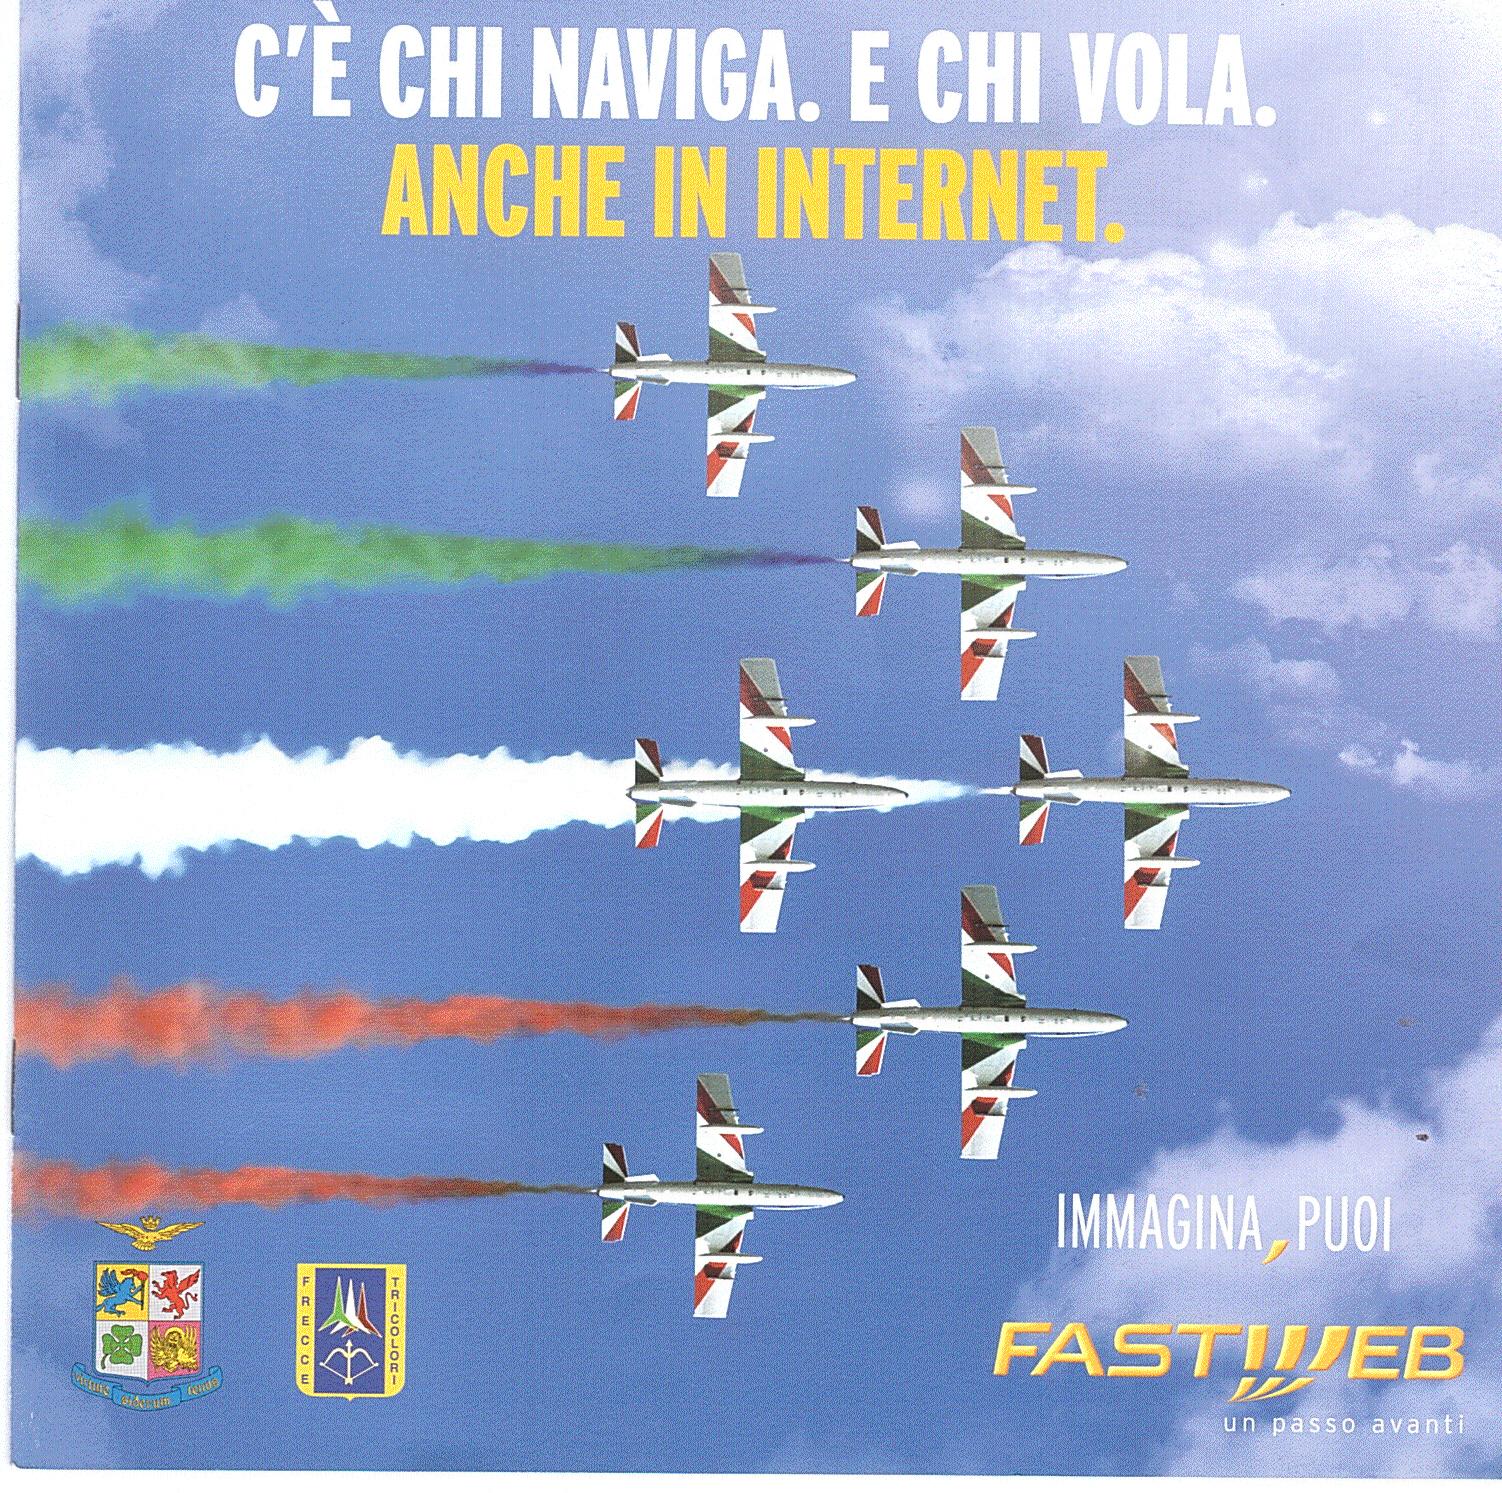 copertina-fastweb-2014.jpg